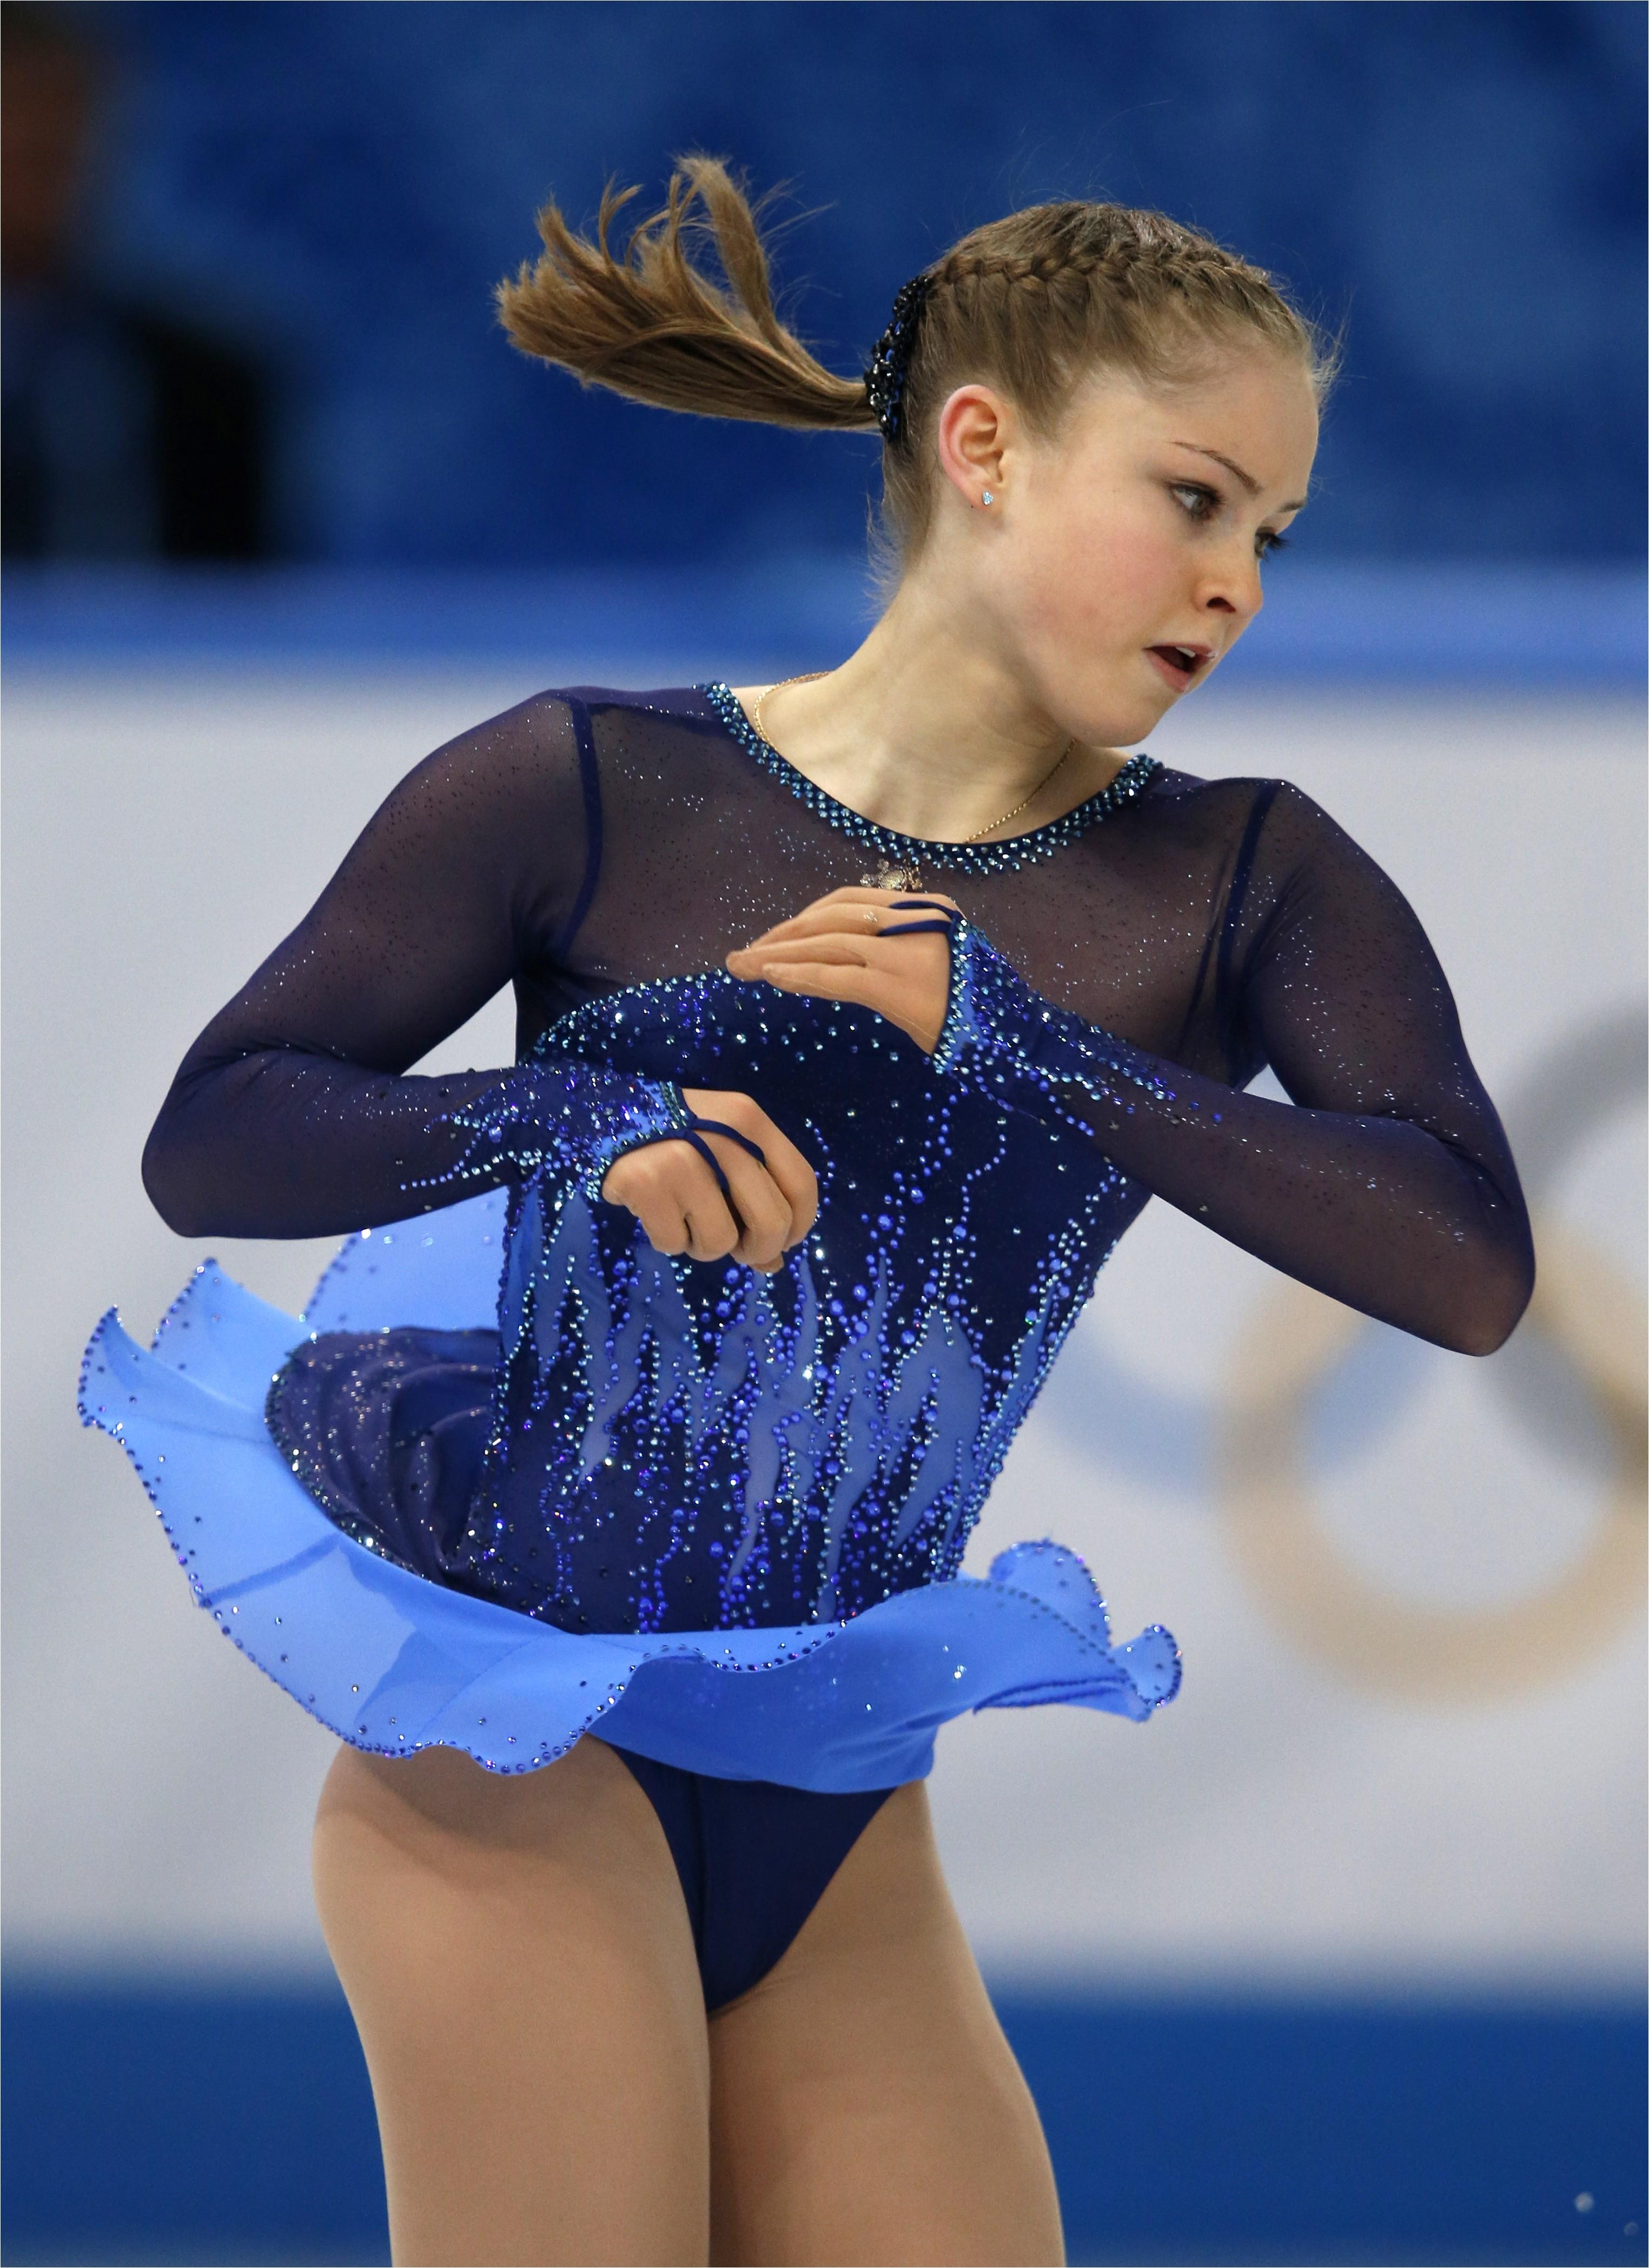 olympics figure skating hair